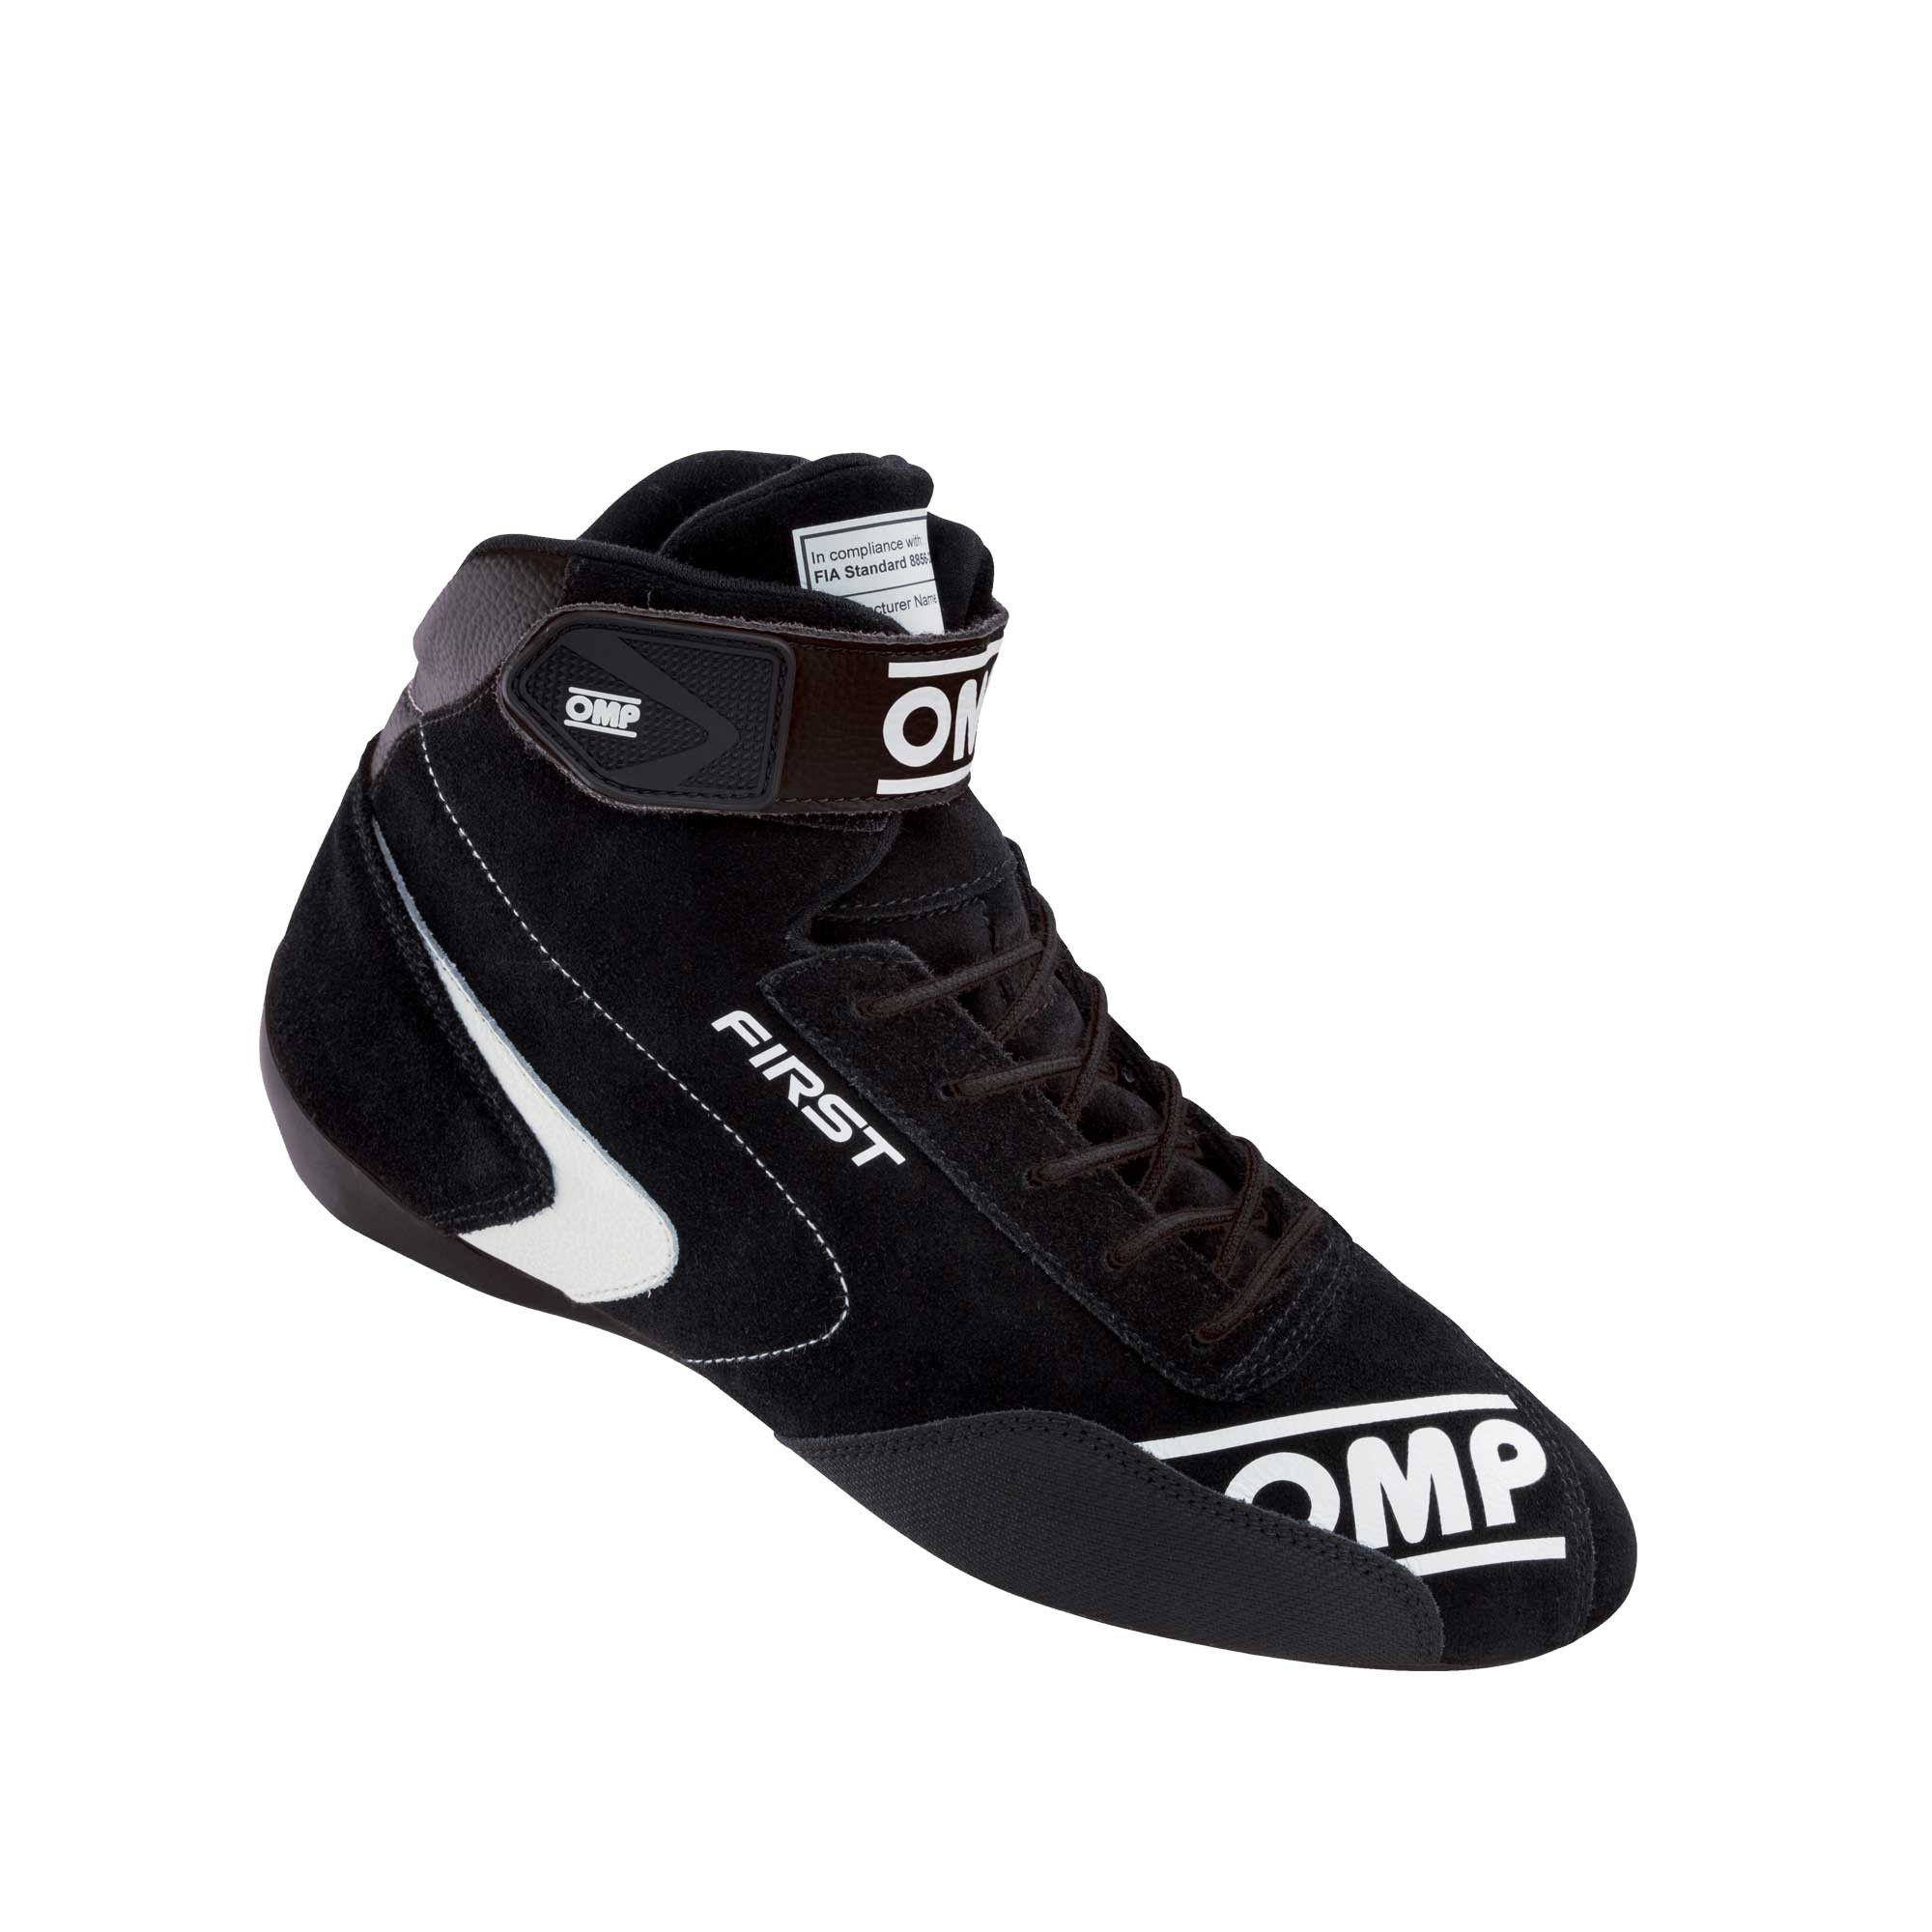 Nova Sapatilha Racing First OMP 2020